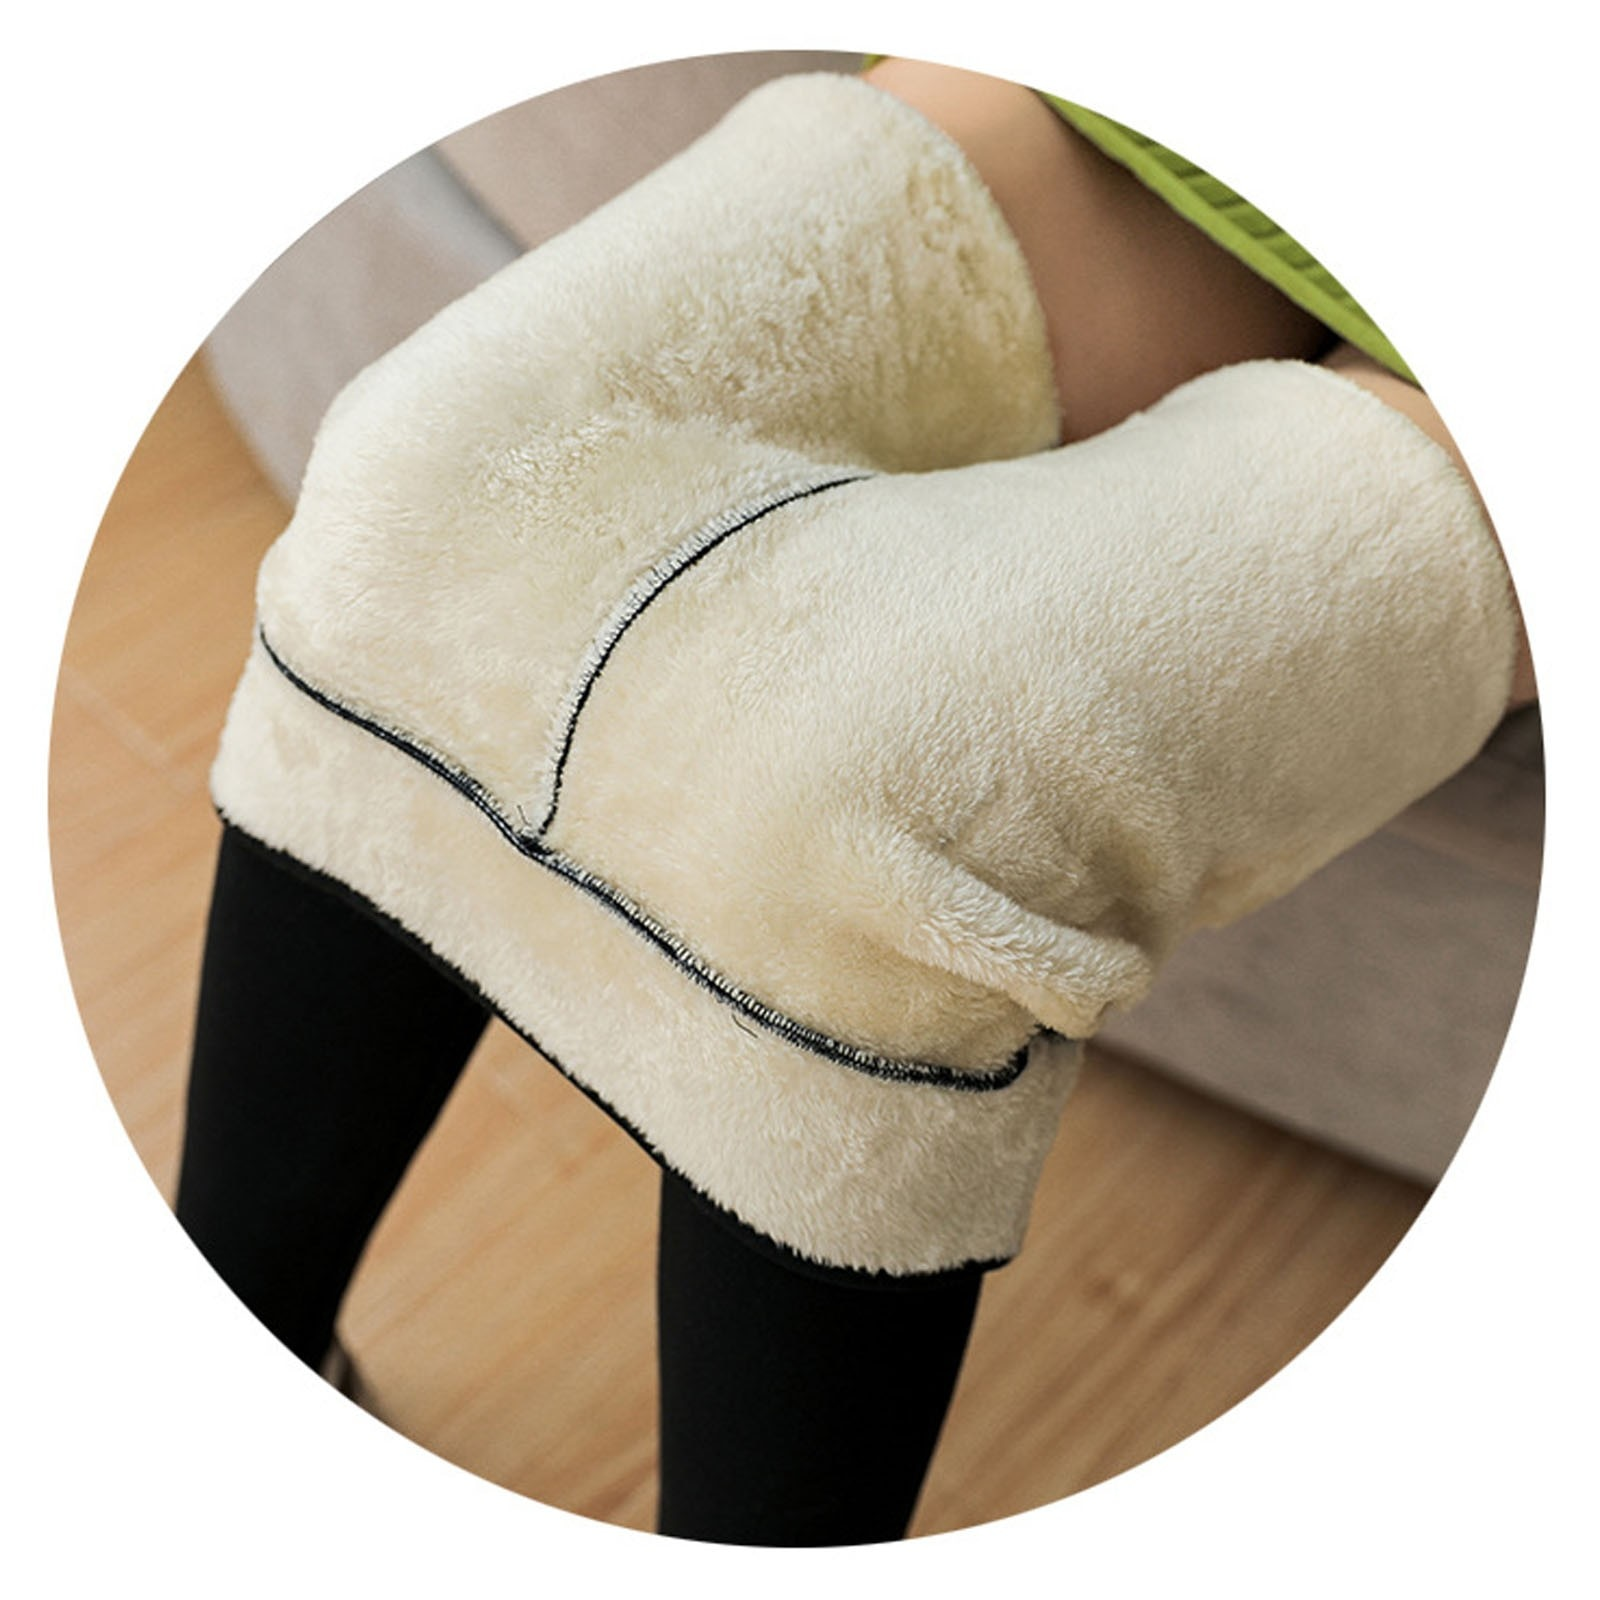 Women's Plush Thick Leggings Leggings Fashion Casual Women Printed Span Ladies High Waist Keep Warm Long Pants